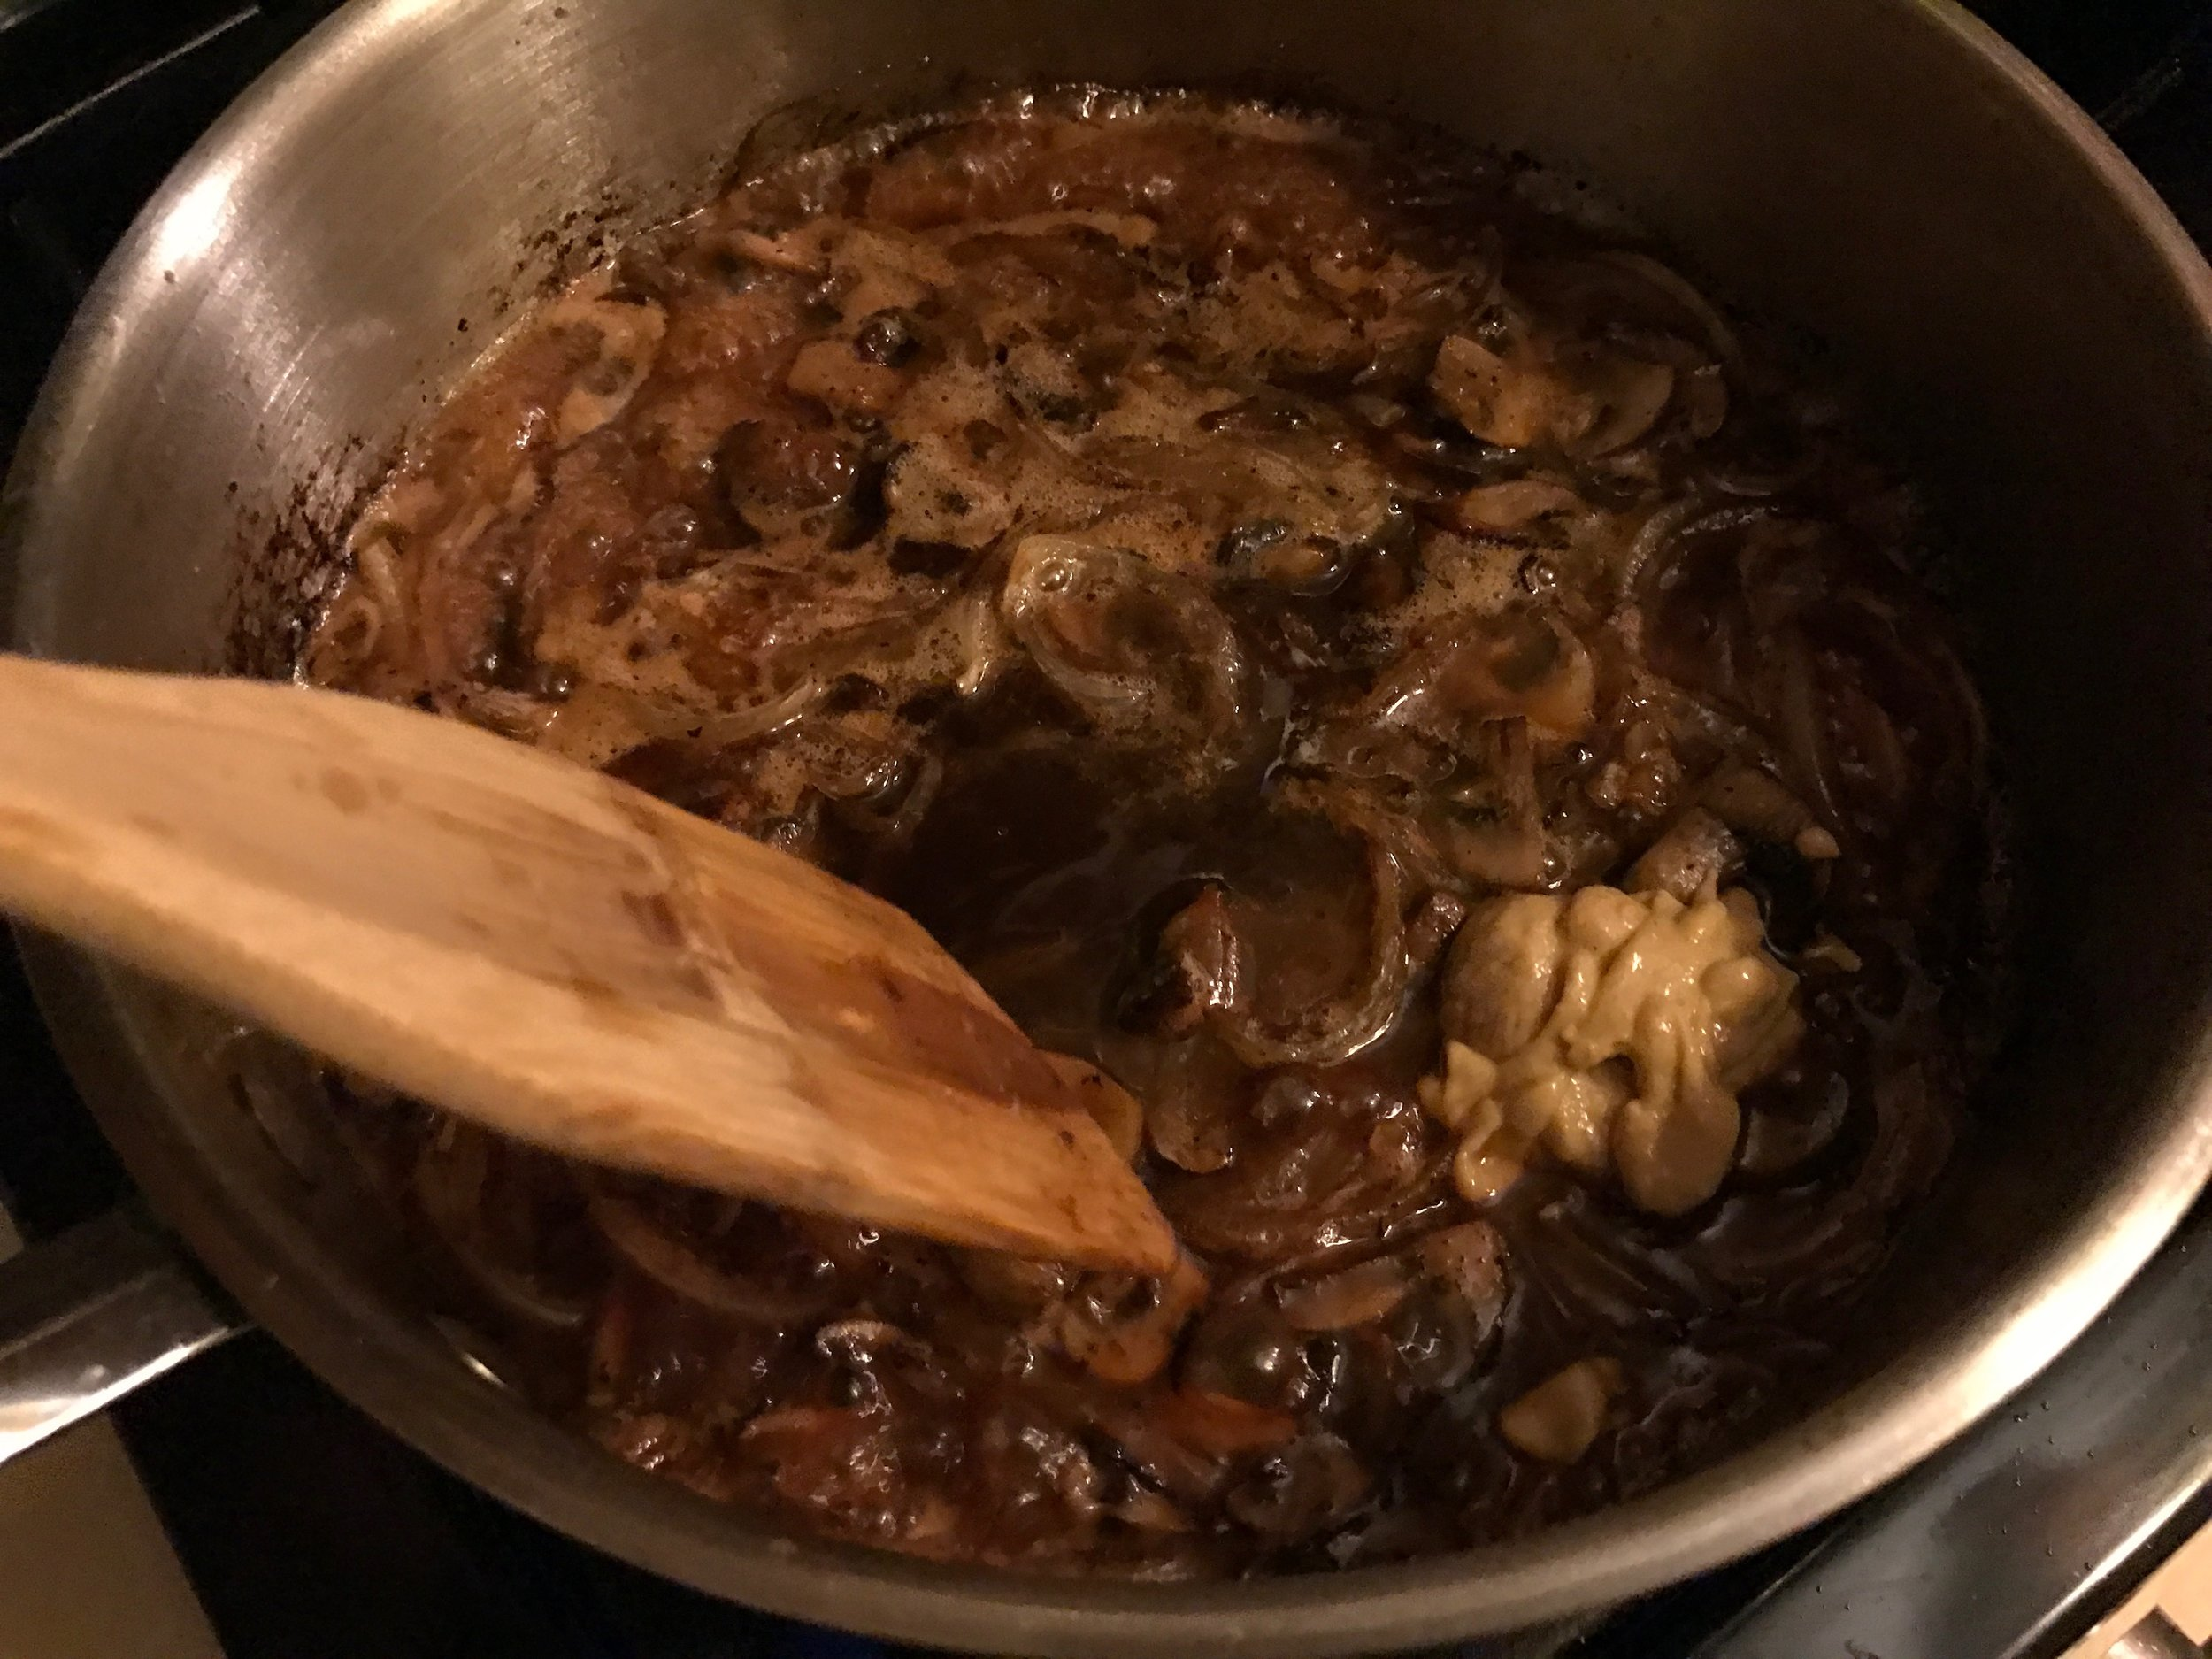 Valicenti Pasta Farm's Ale Caramelized Onion & Mushroom Recipe